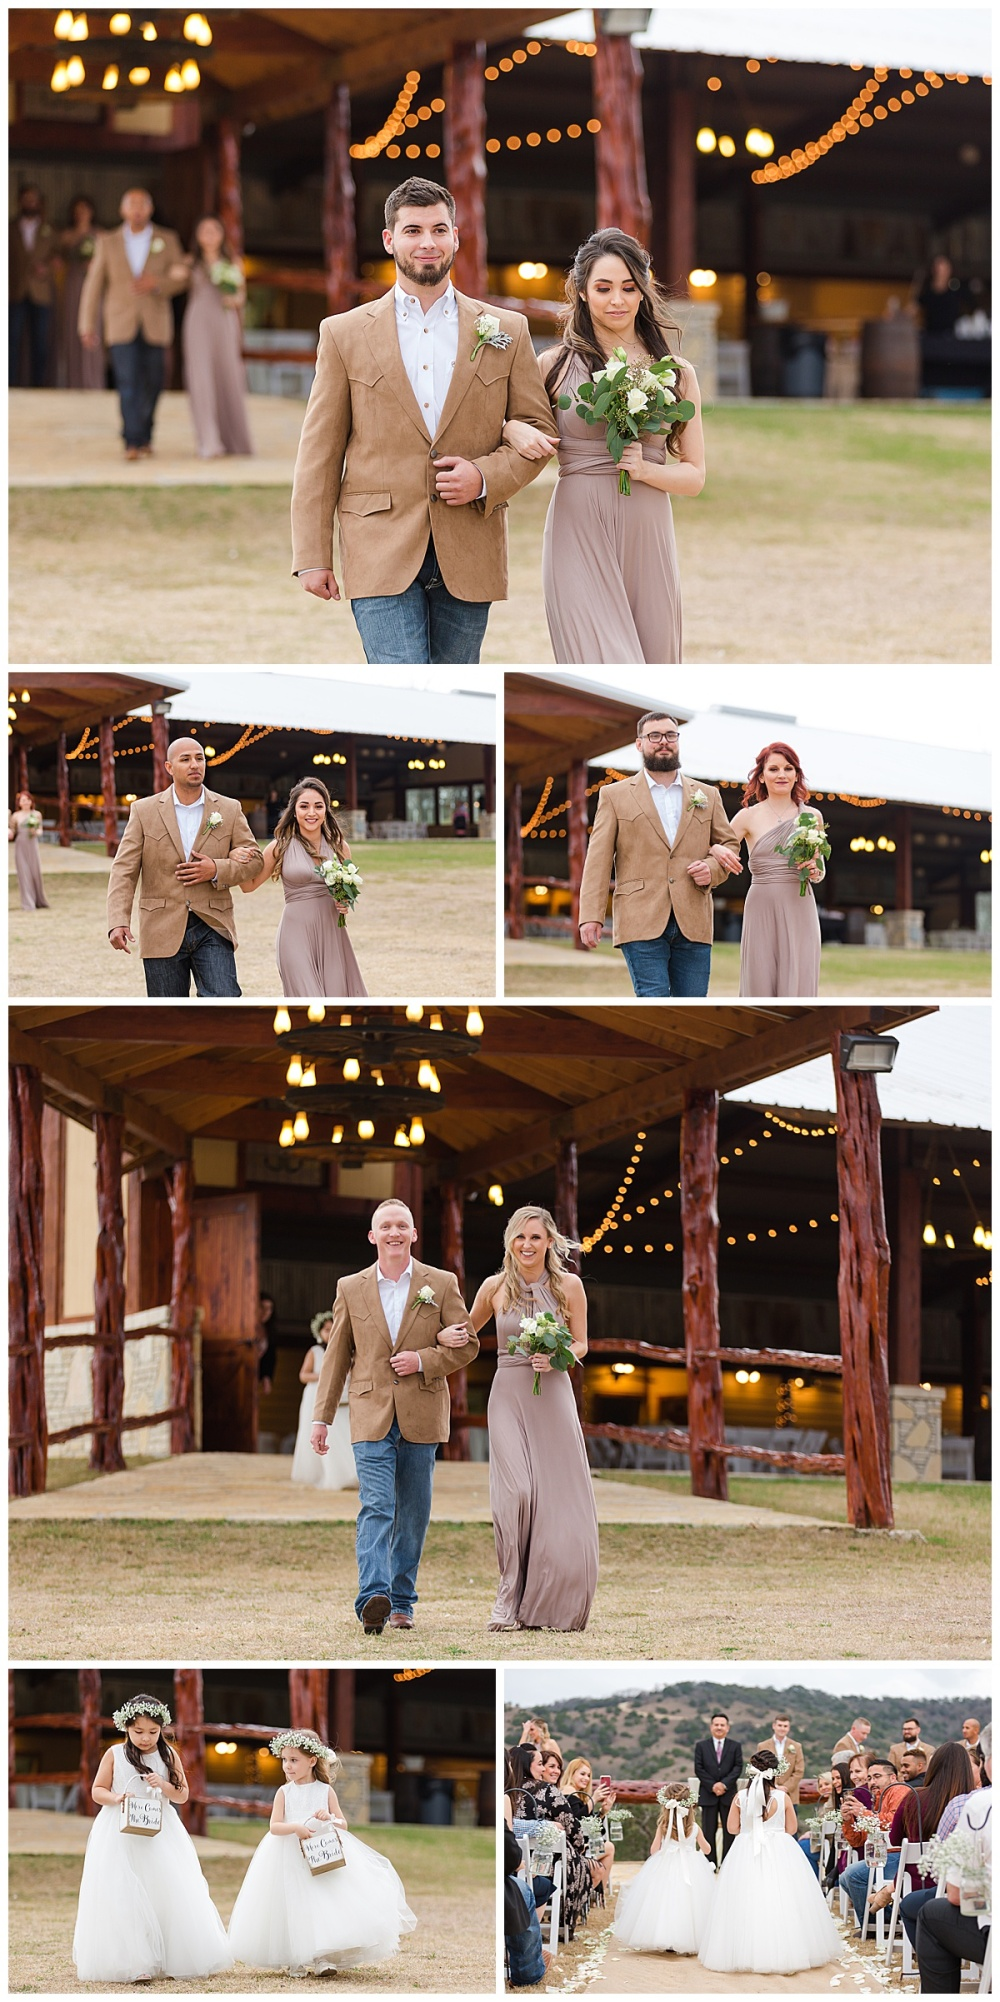 Wedding-Photographer-Texas-Hill-Country-Happy-H-Ranch-Comfor-Texas-Carly-Barton-Photography_0020.jpg